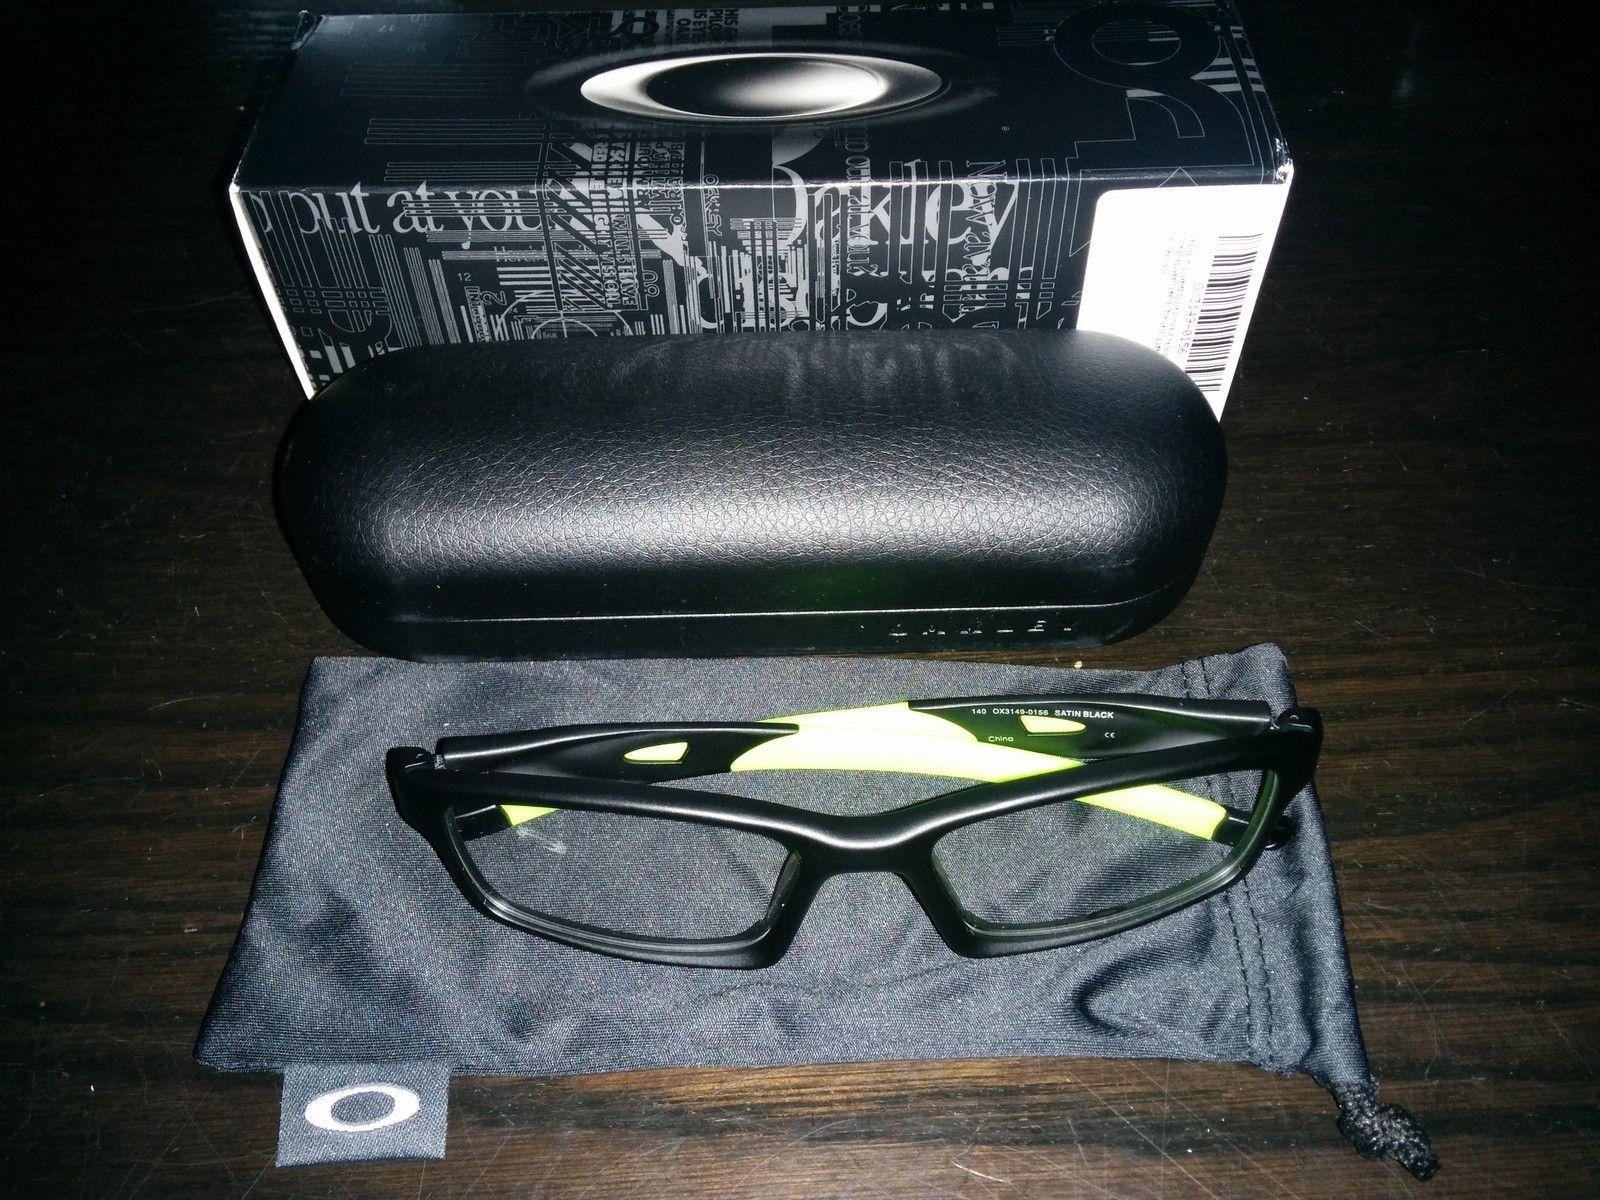 Crosslink Pro A (56) Satin black / Retina burn - uploadfromtaptalk1450211934514.jpg